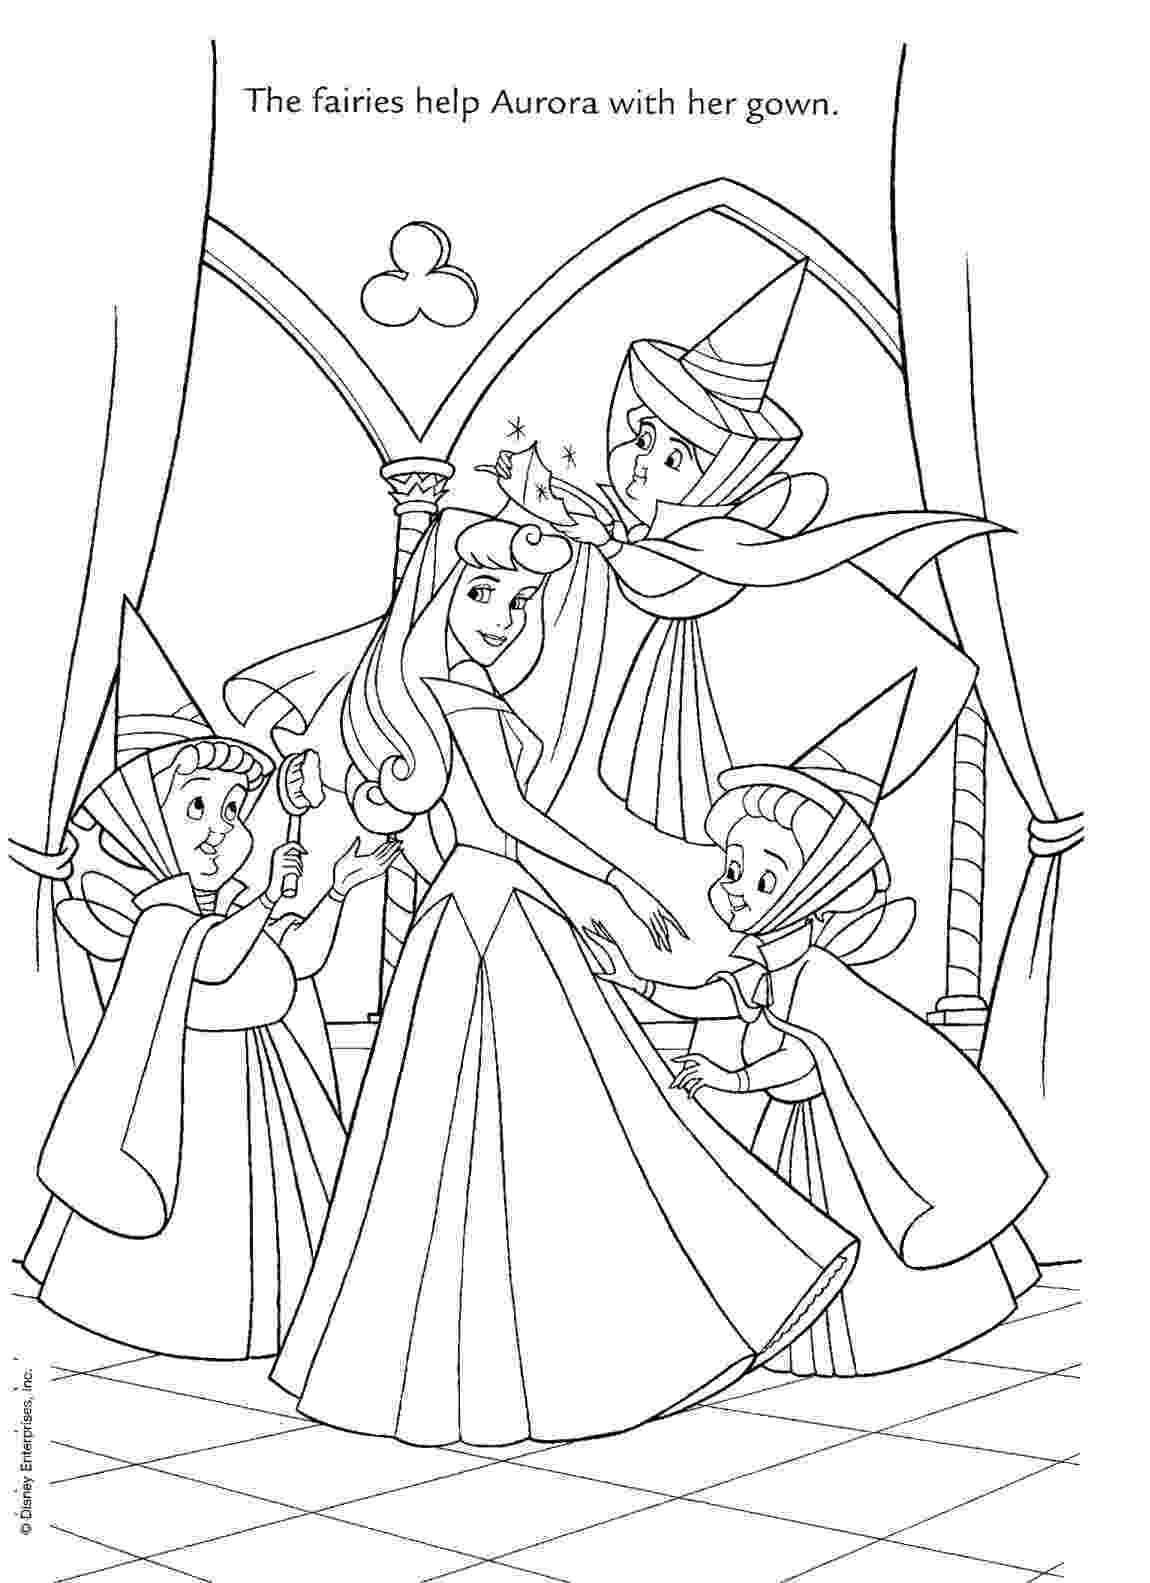 wedding coloring page kids n funcom 34 coloring pages of marry and weddings coloring page wedding